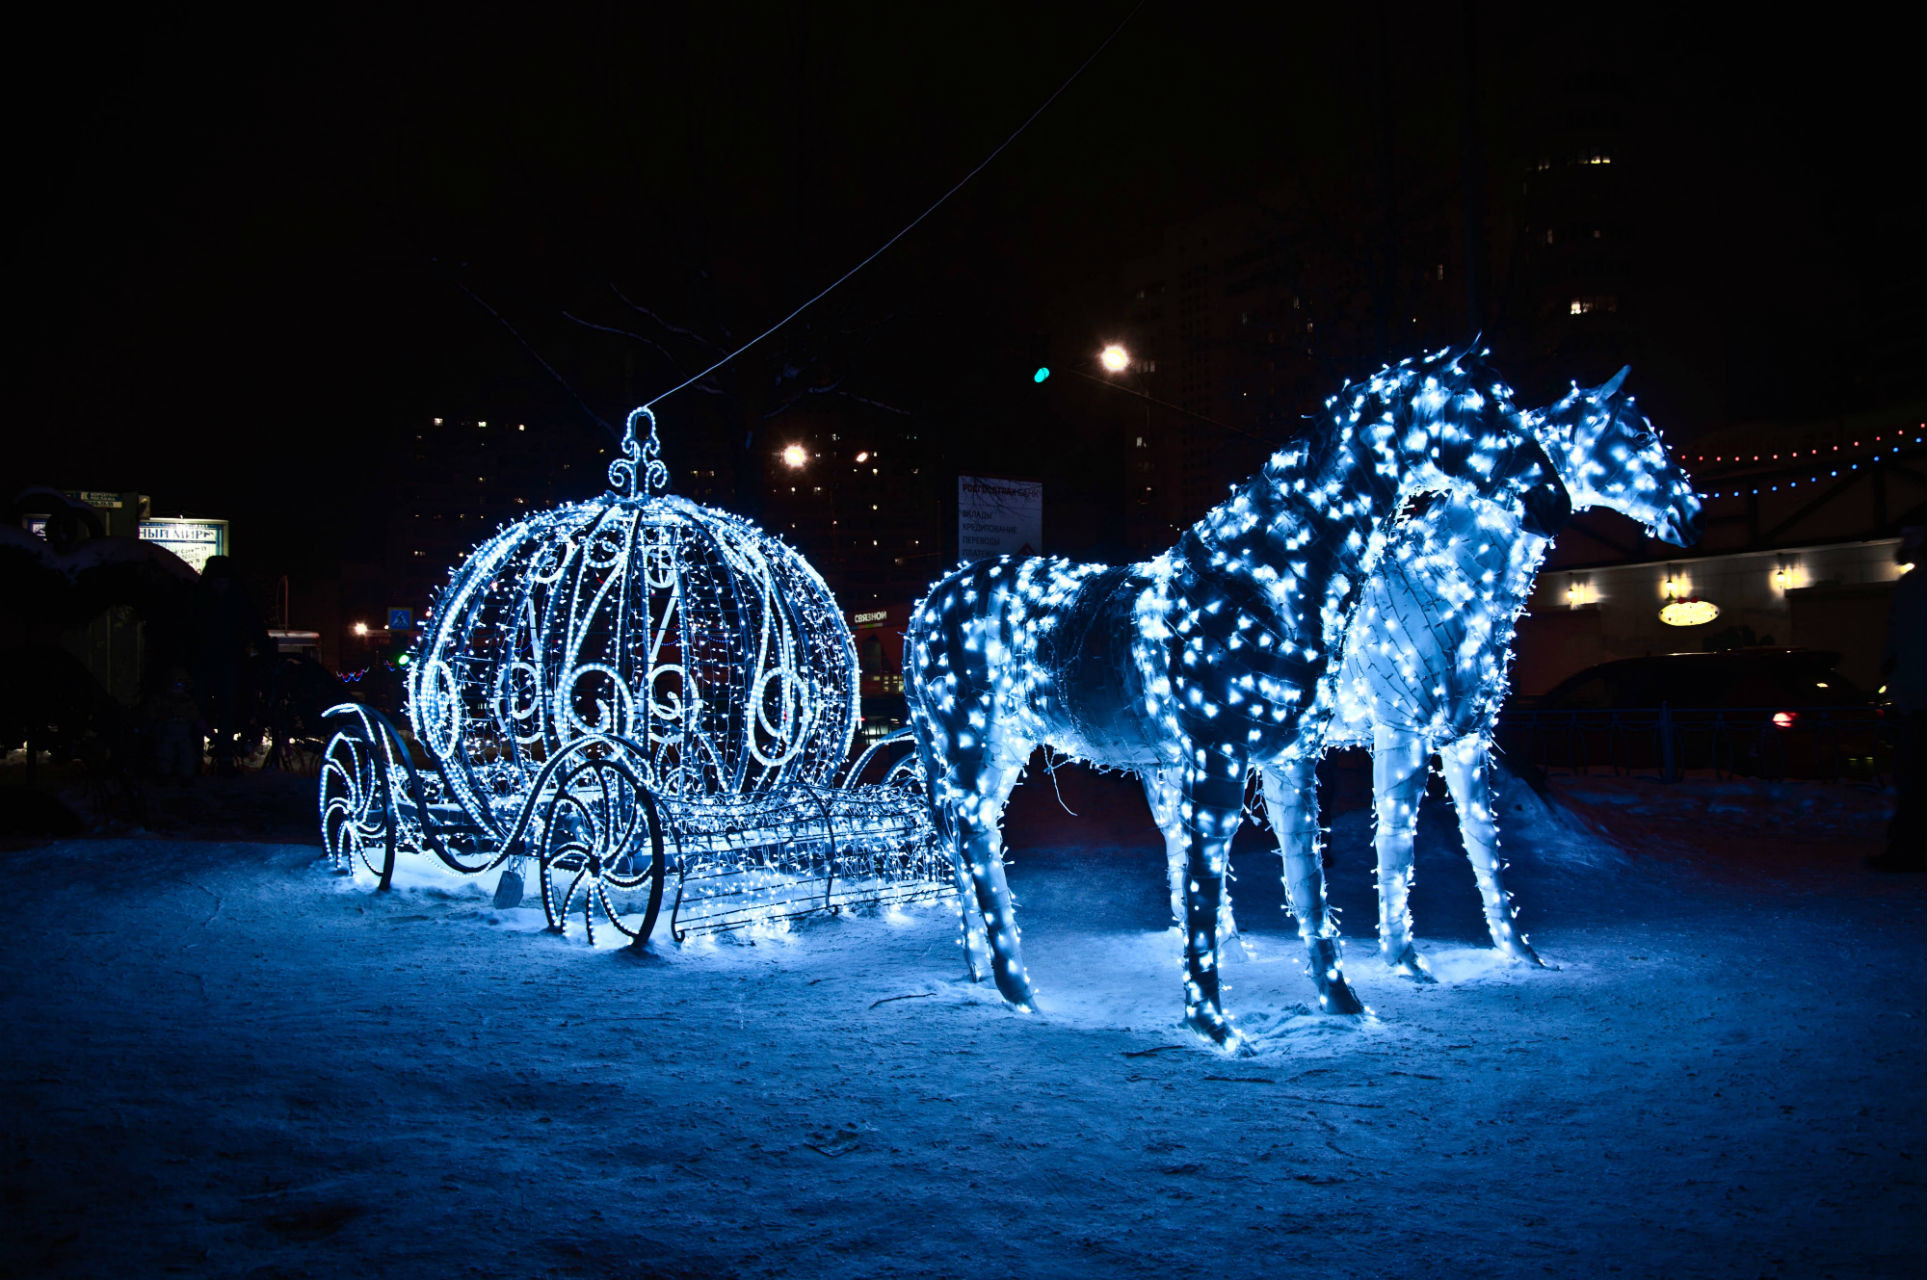 horses light holiday coach vehicles princess winter christmas .